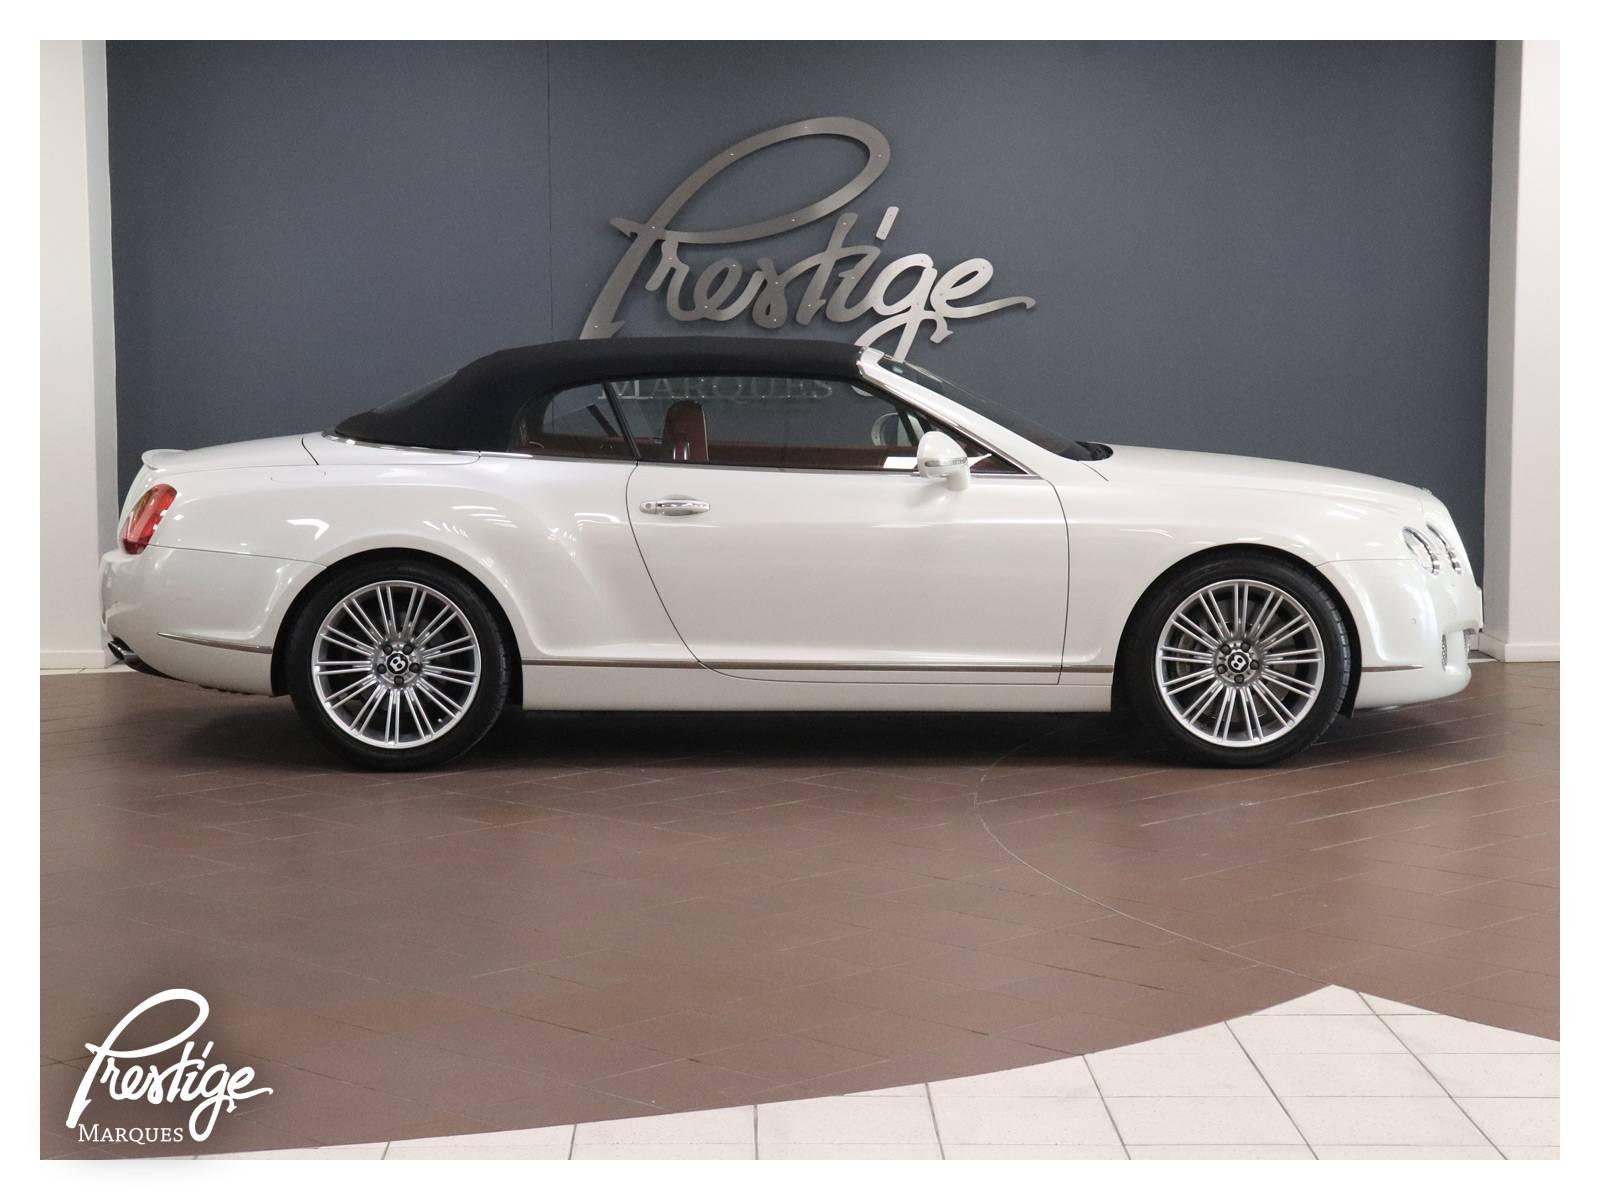 2011-Bentley-continental-Prestige-Marques-Randburg-Sandton-2